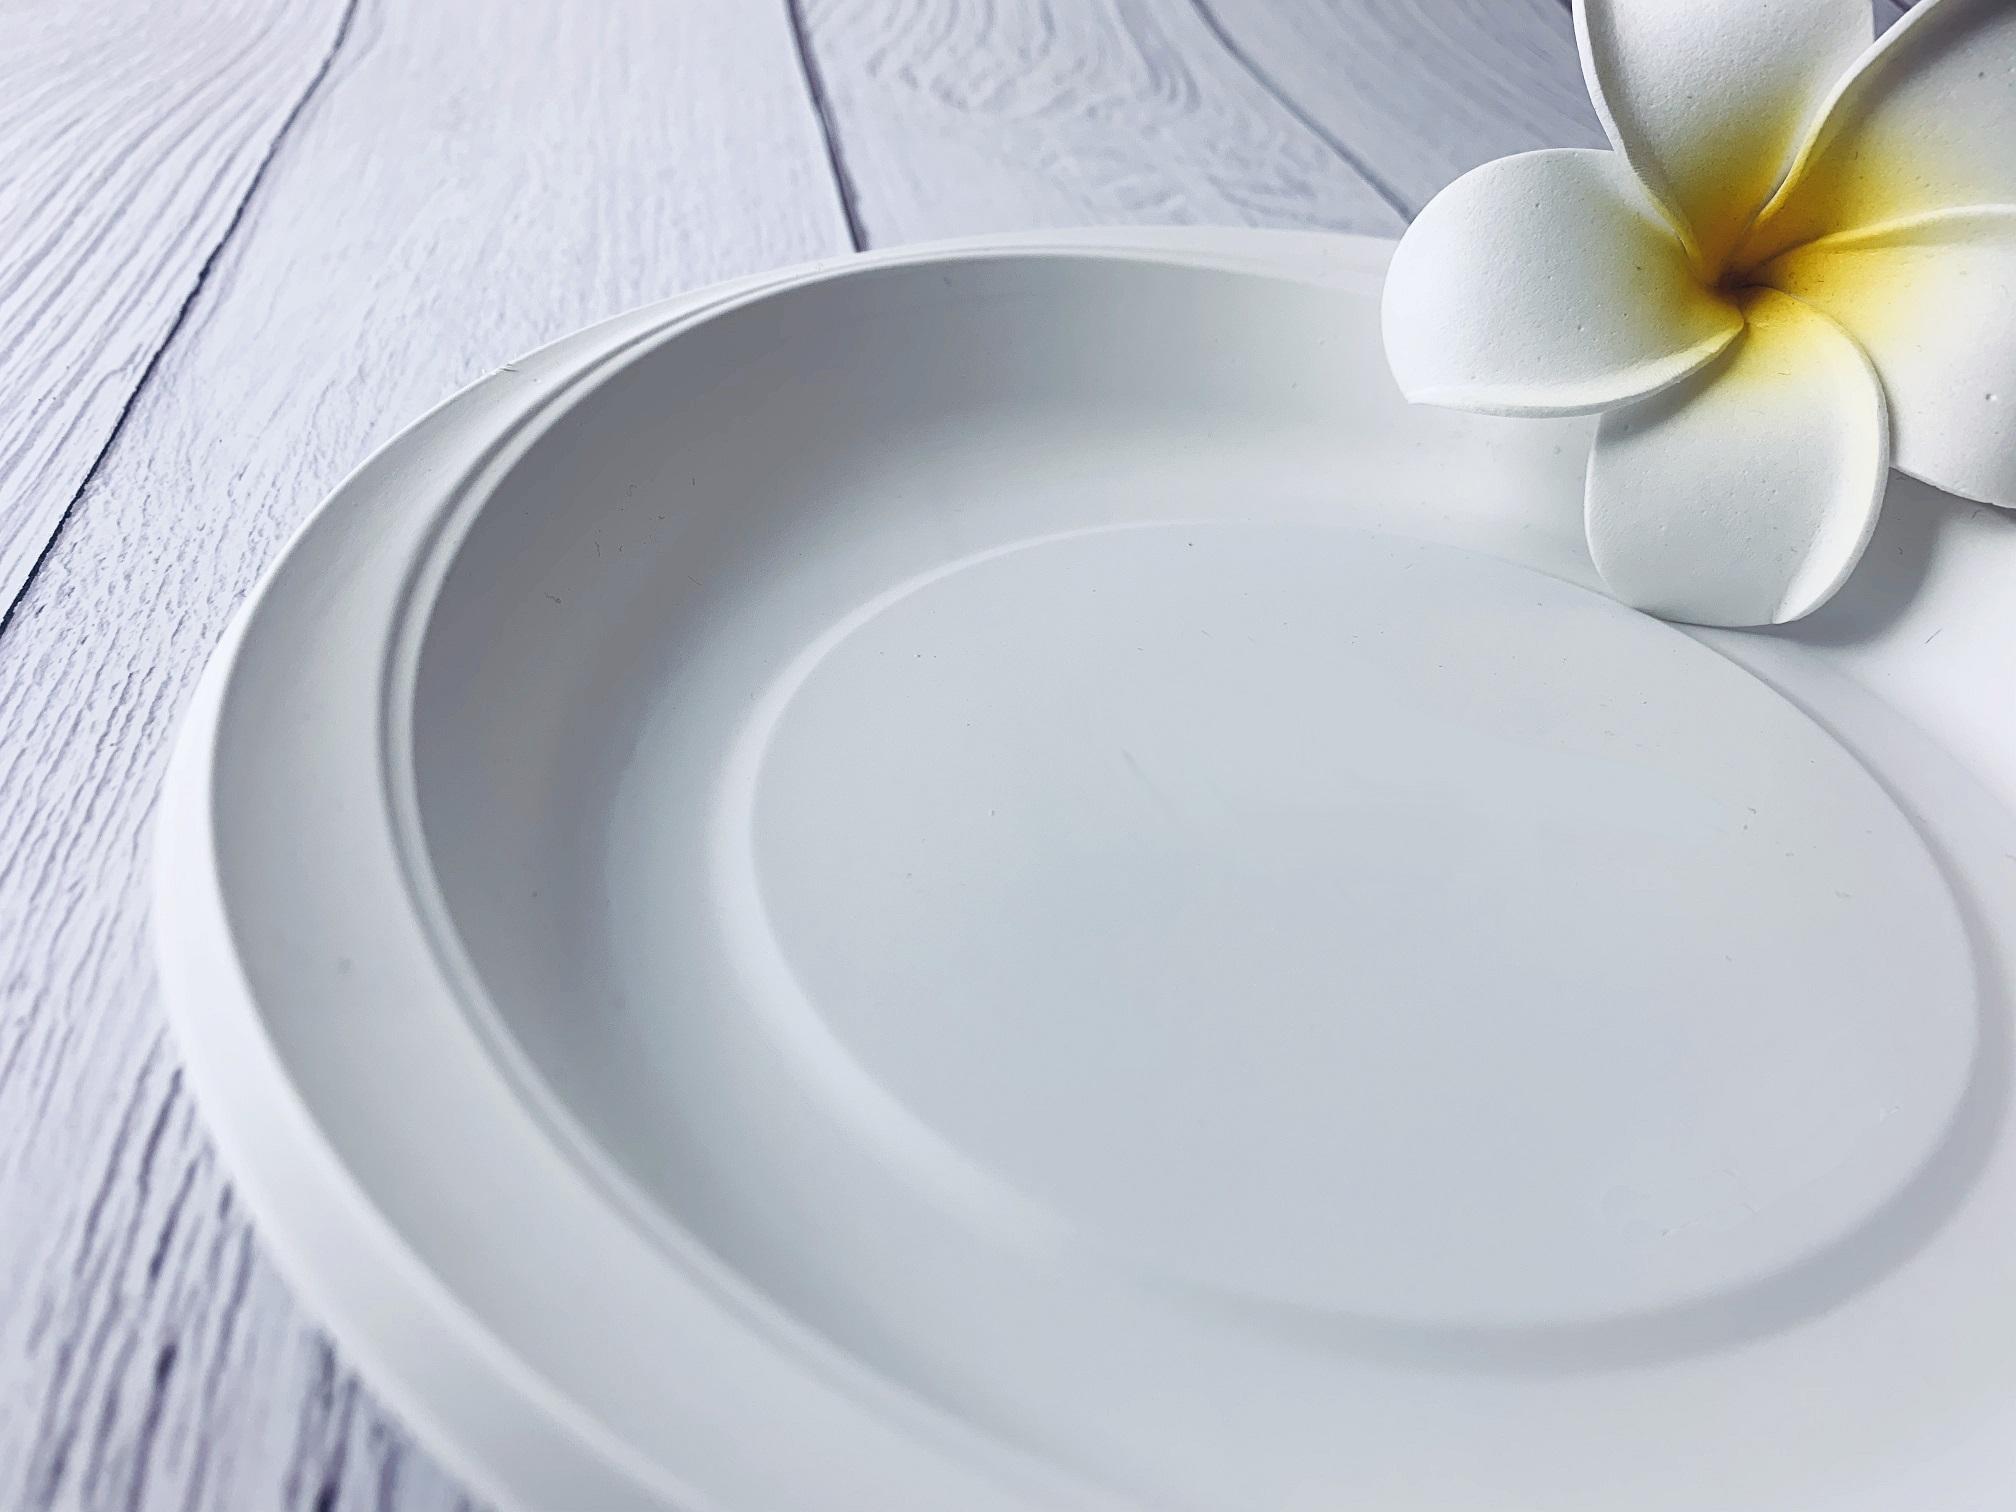 100pcs Cornware Plate 9 Inch - Biodegradable Eco Friendly Corn Based Disposable Tableware.